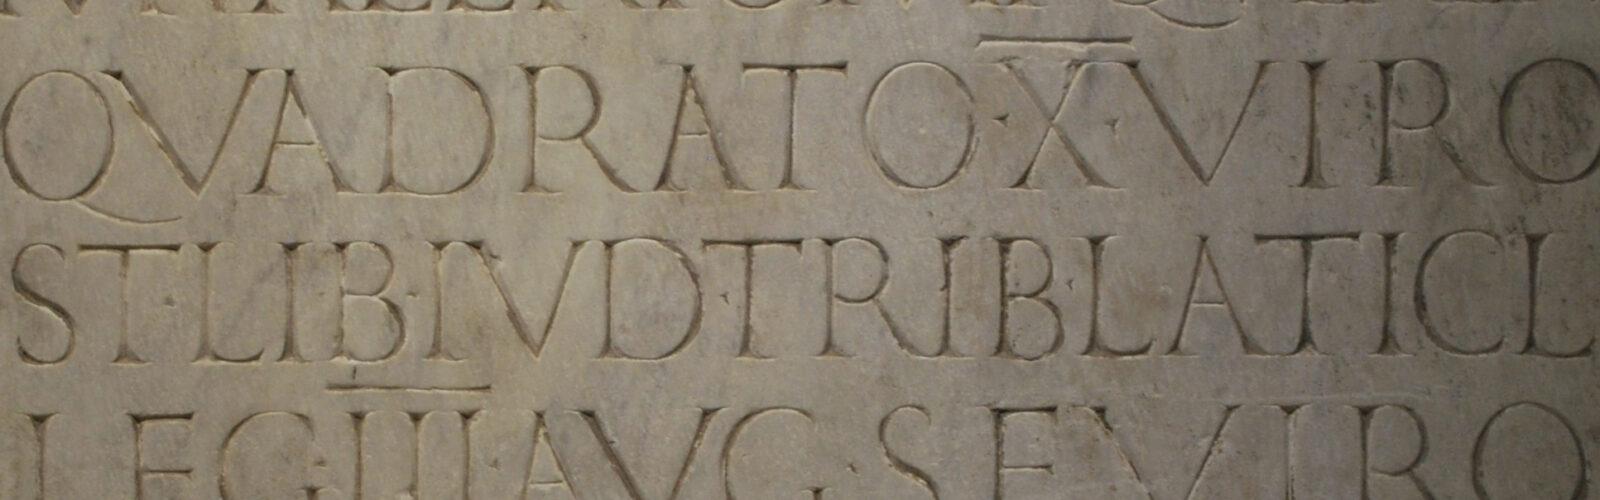 Header Latin Epigraphy